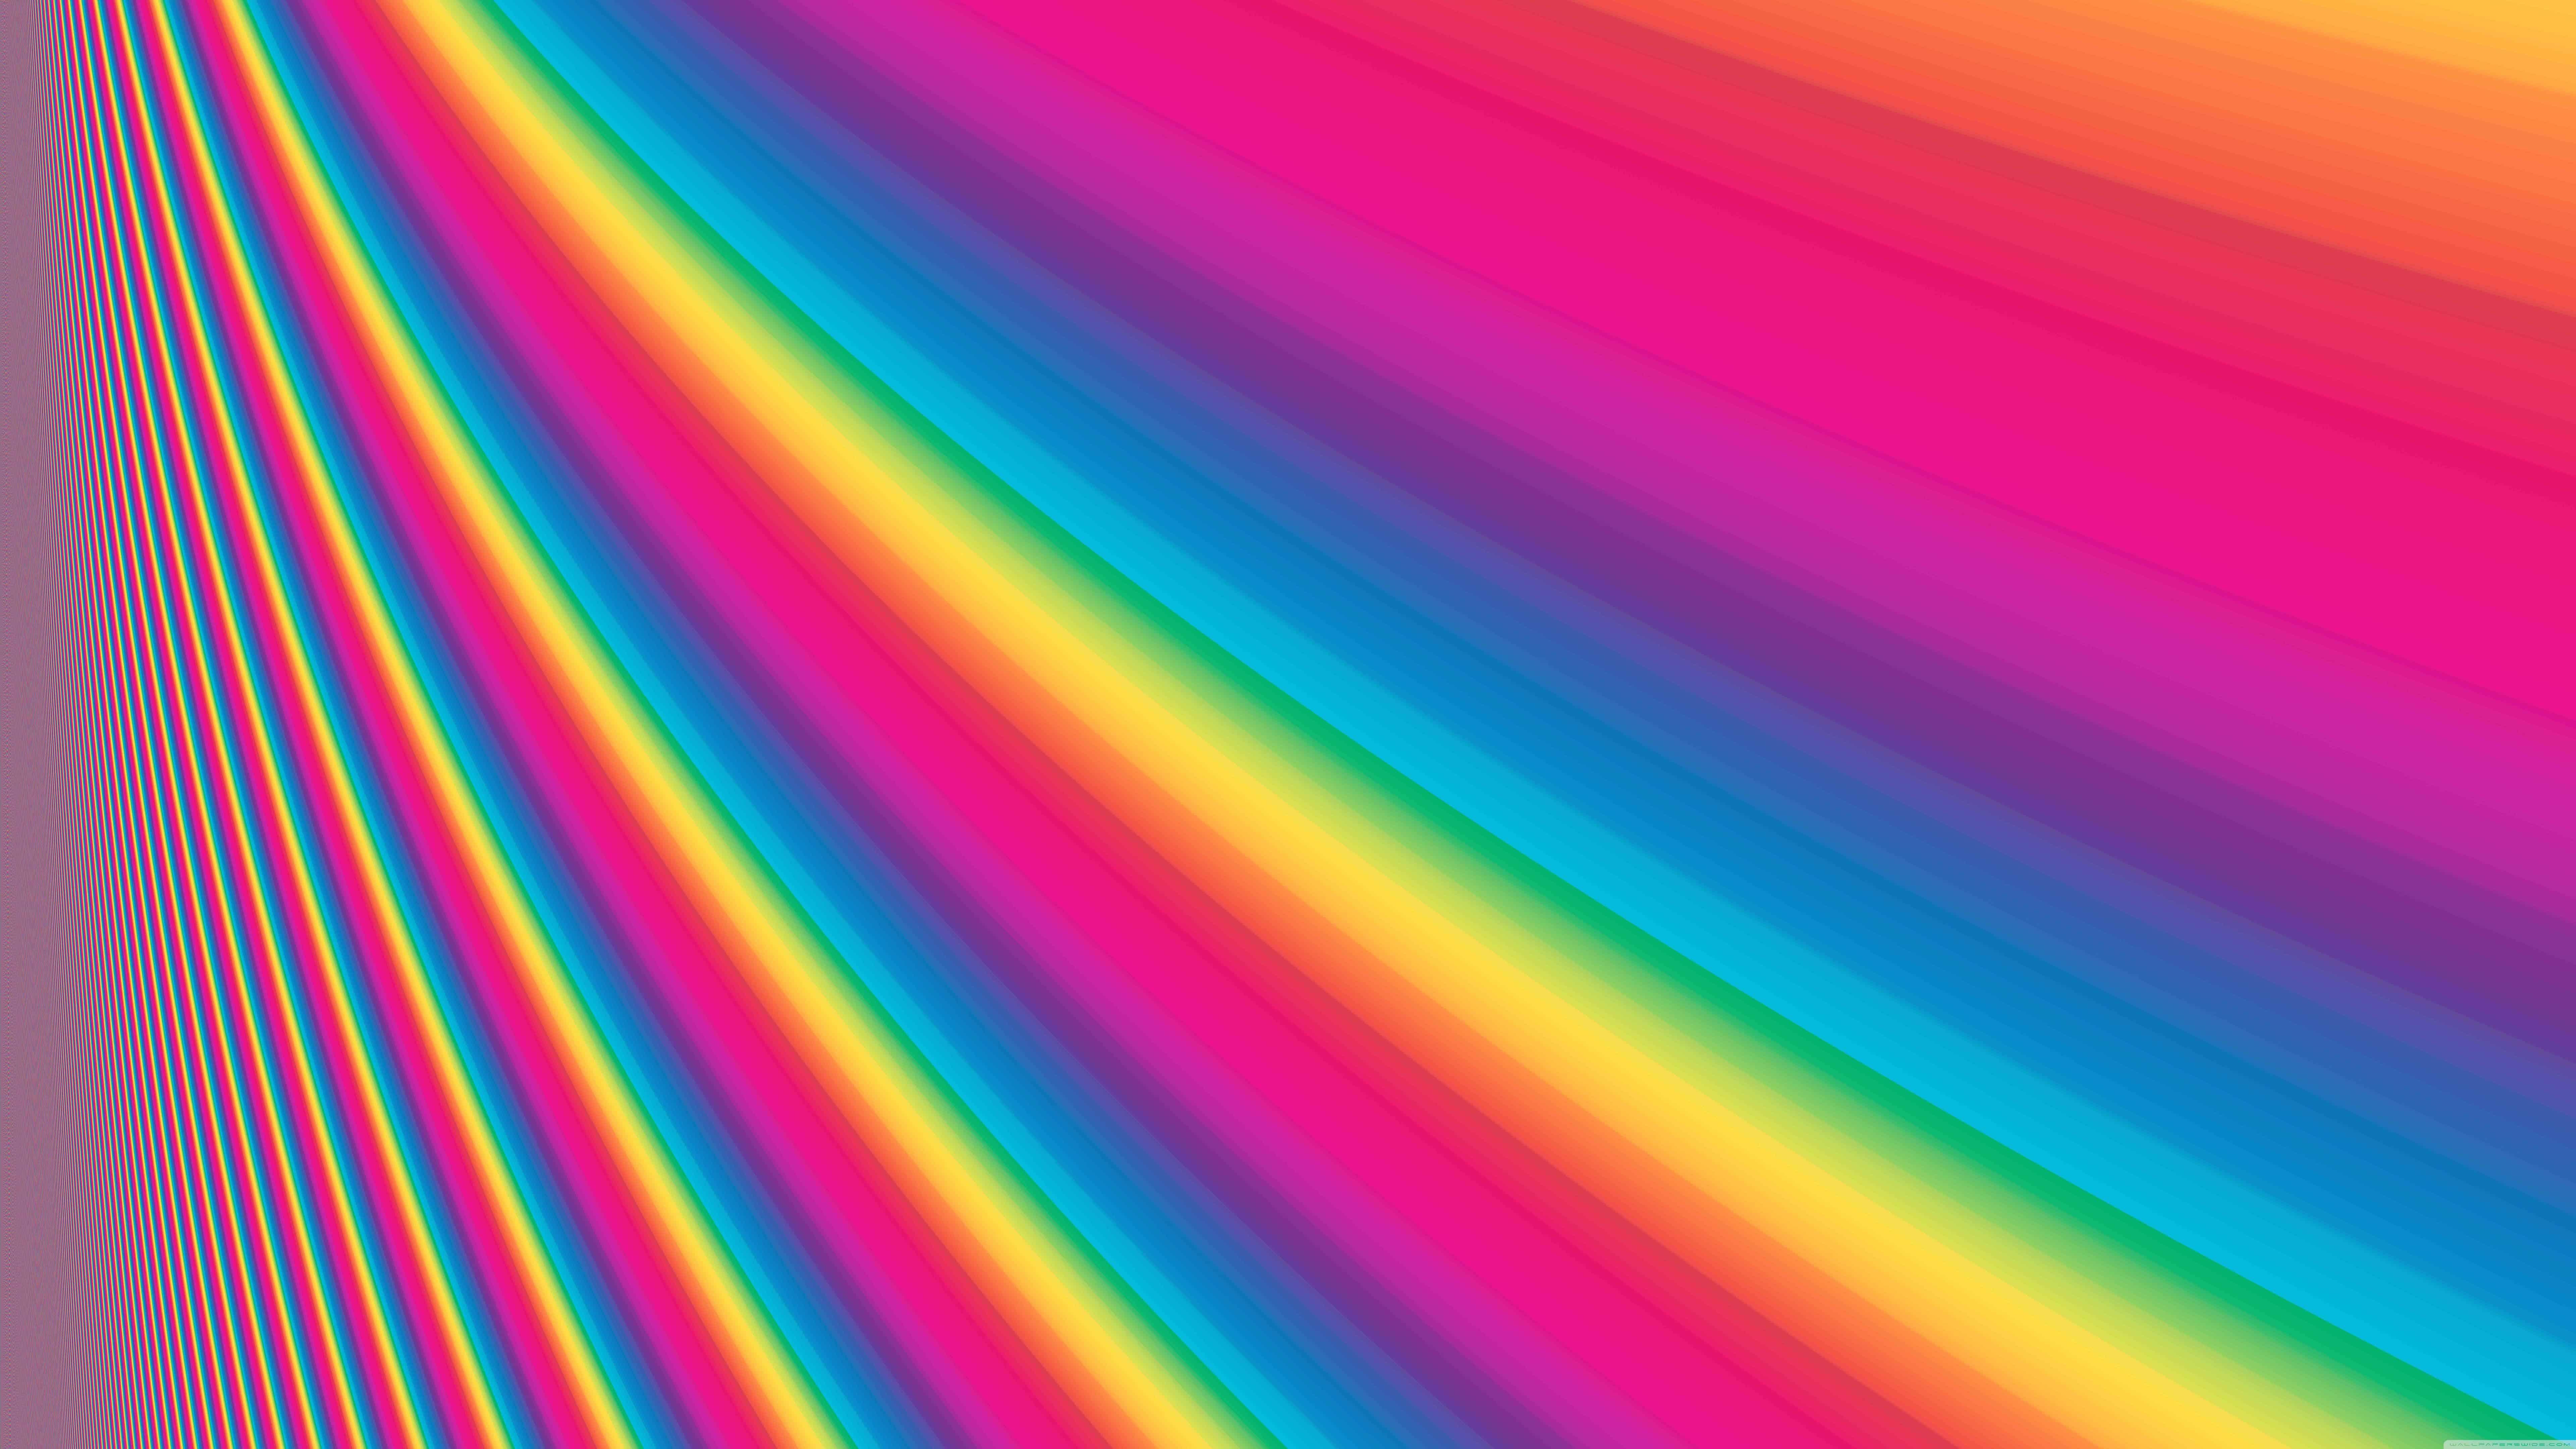 color spectrum uhd 8k wallpaper